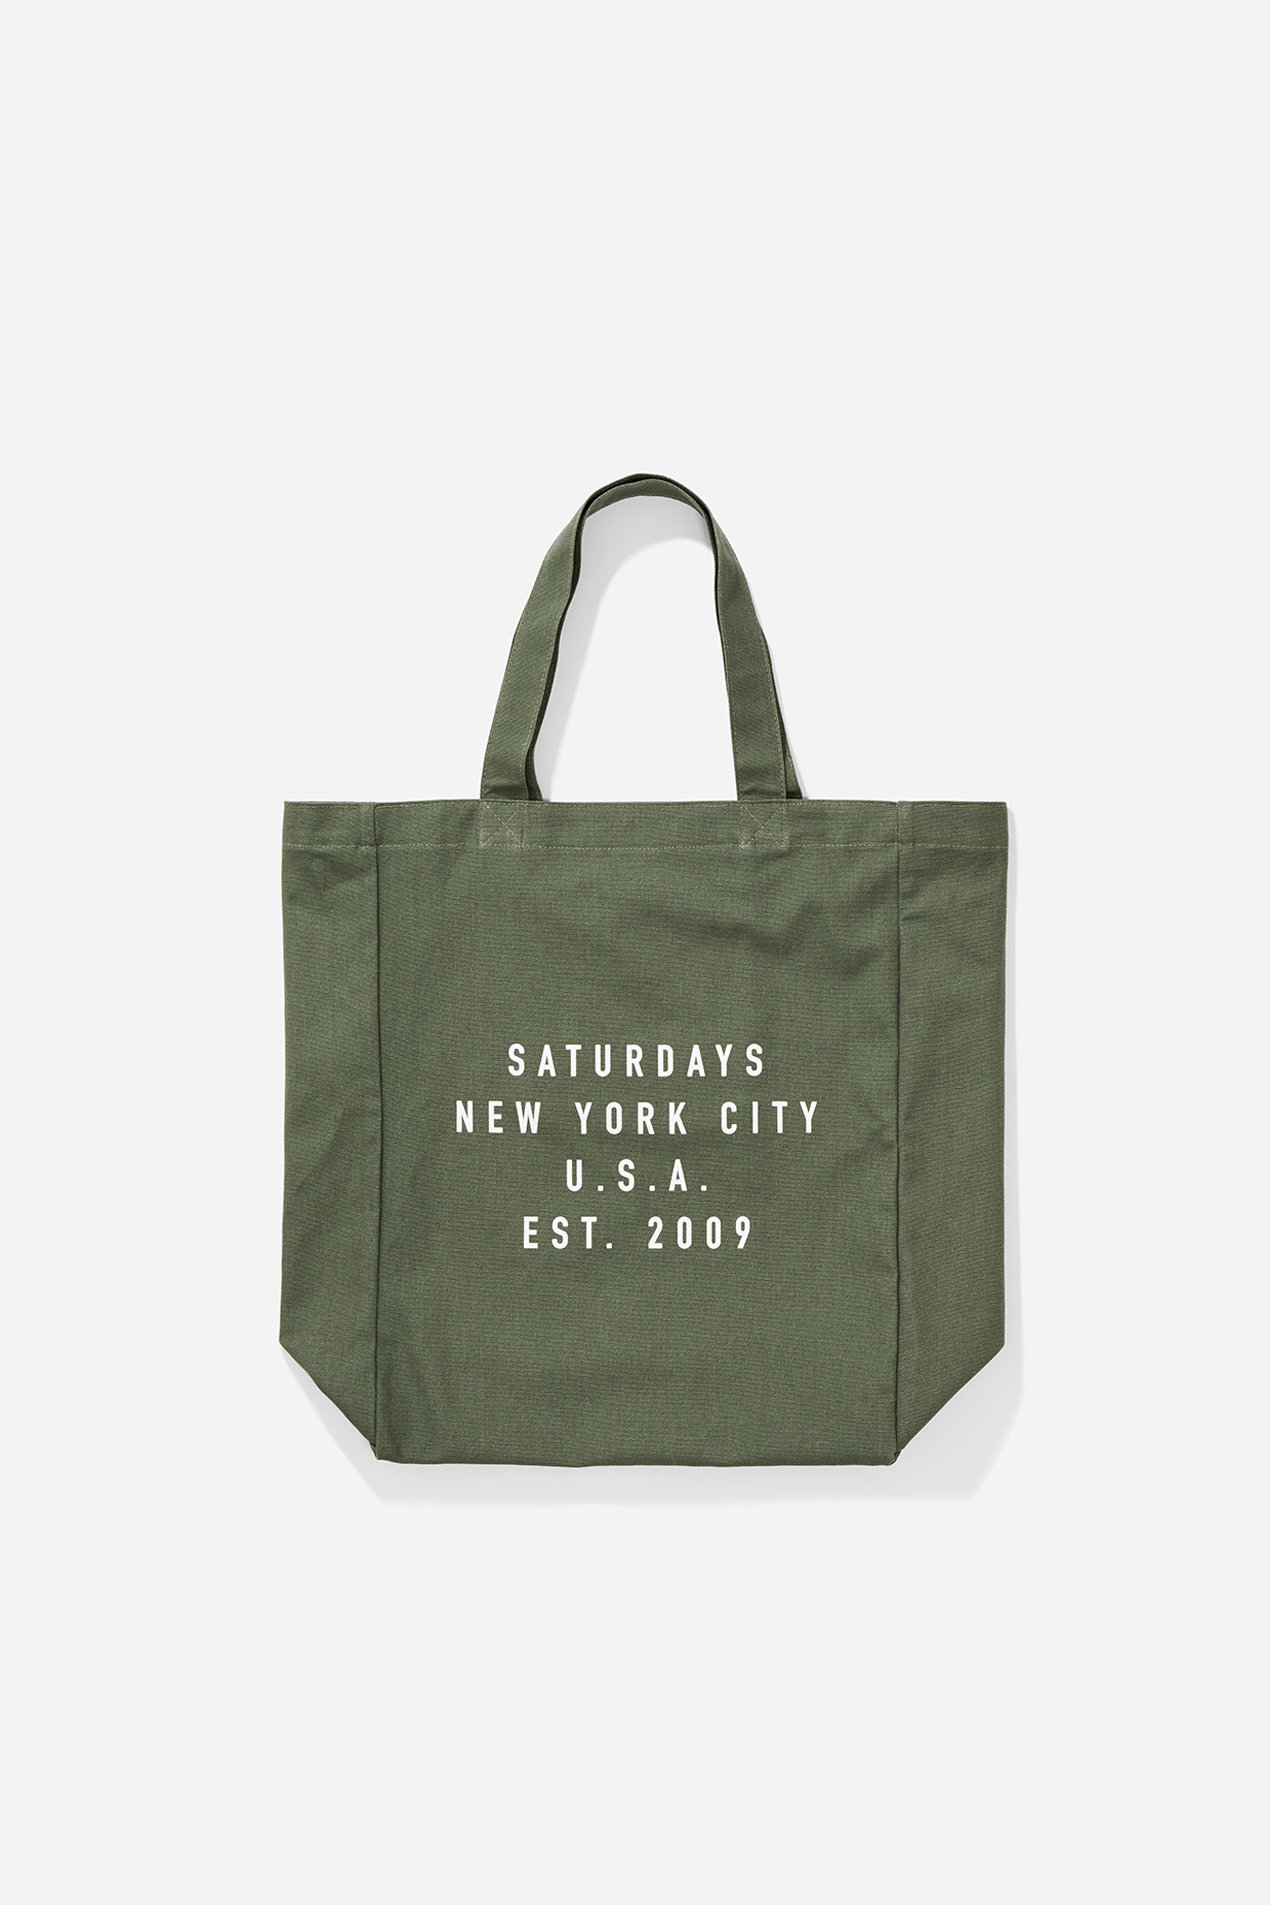 SPRING 2018 SATURDAYS NEW YORK CITY ESTABLISHED USA TOTE / サタデーズサーフ USA エスタブリッシュ ロゴトートバッグ (KHAKI)